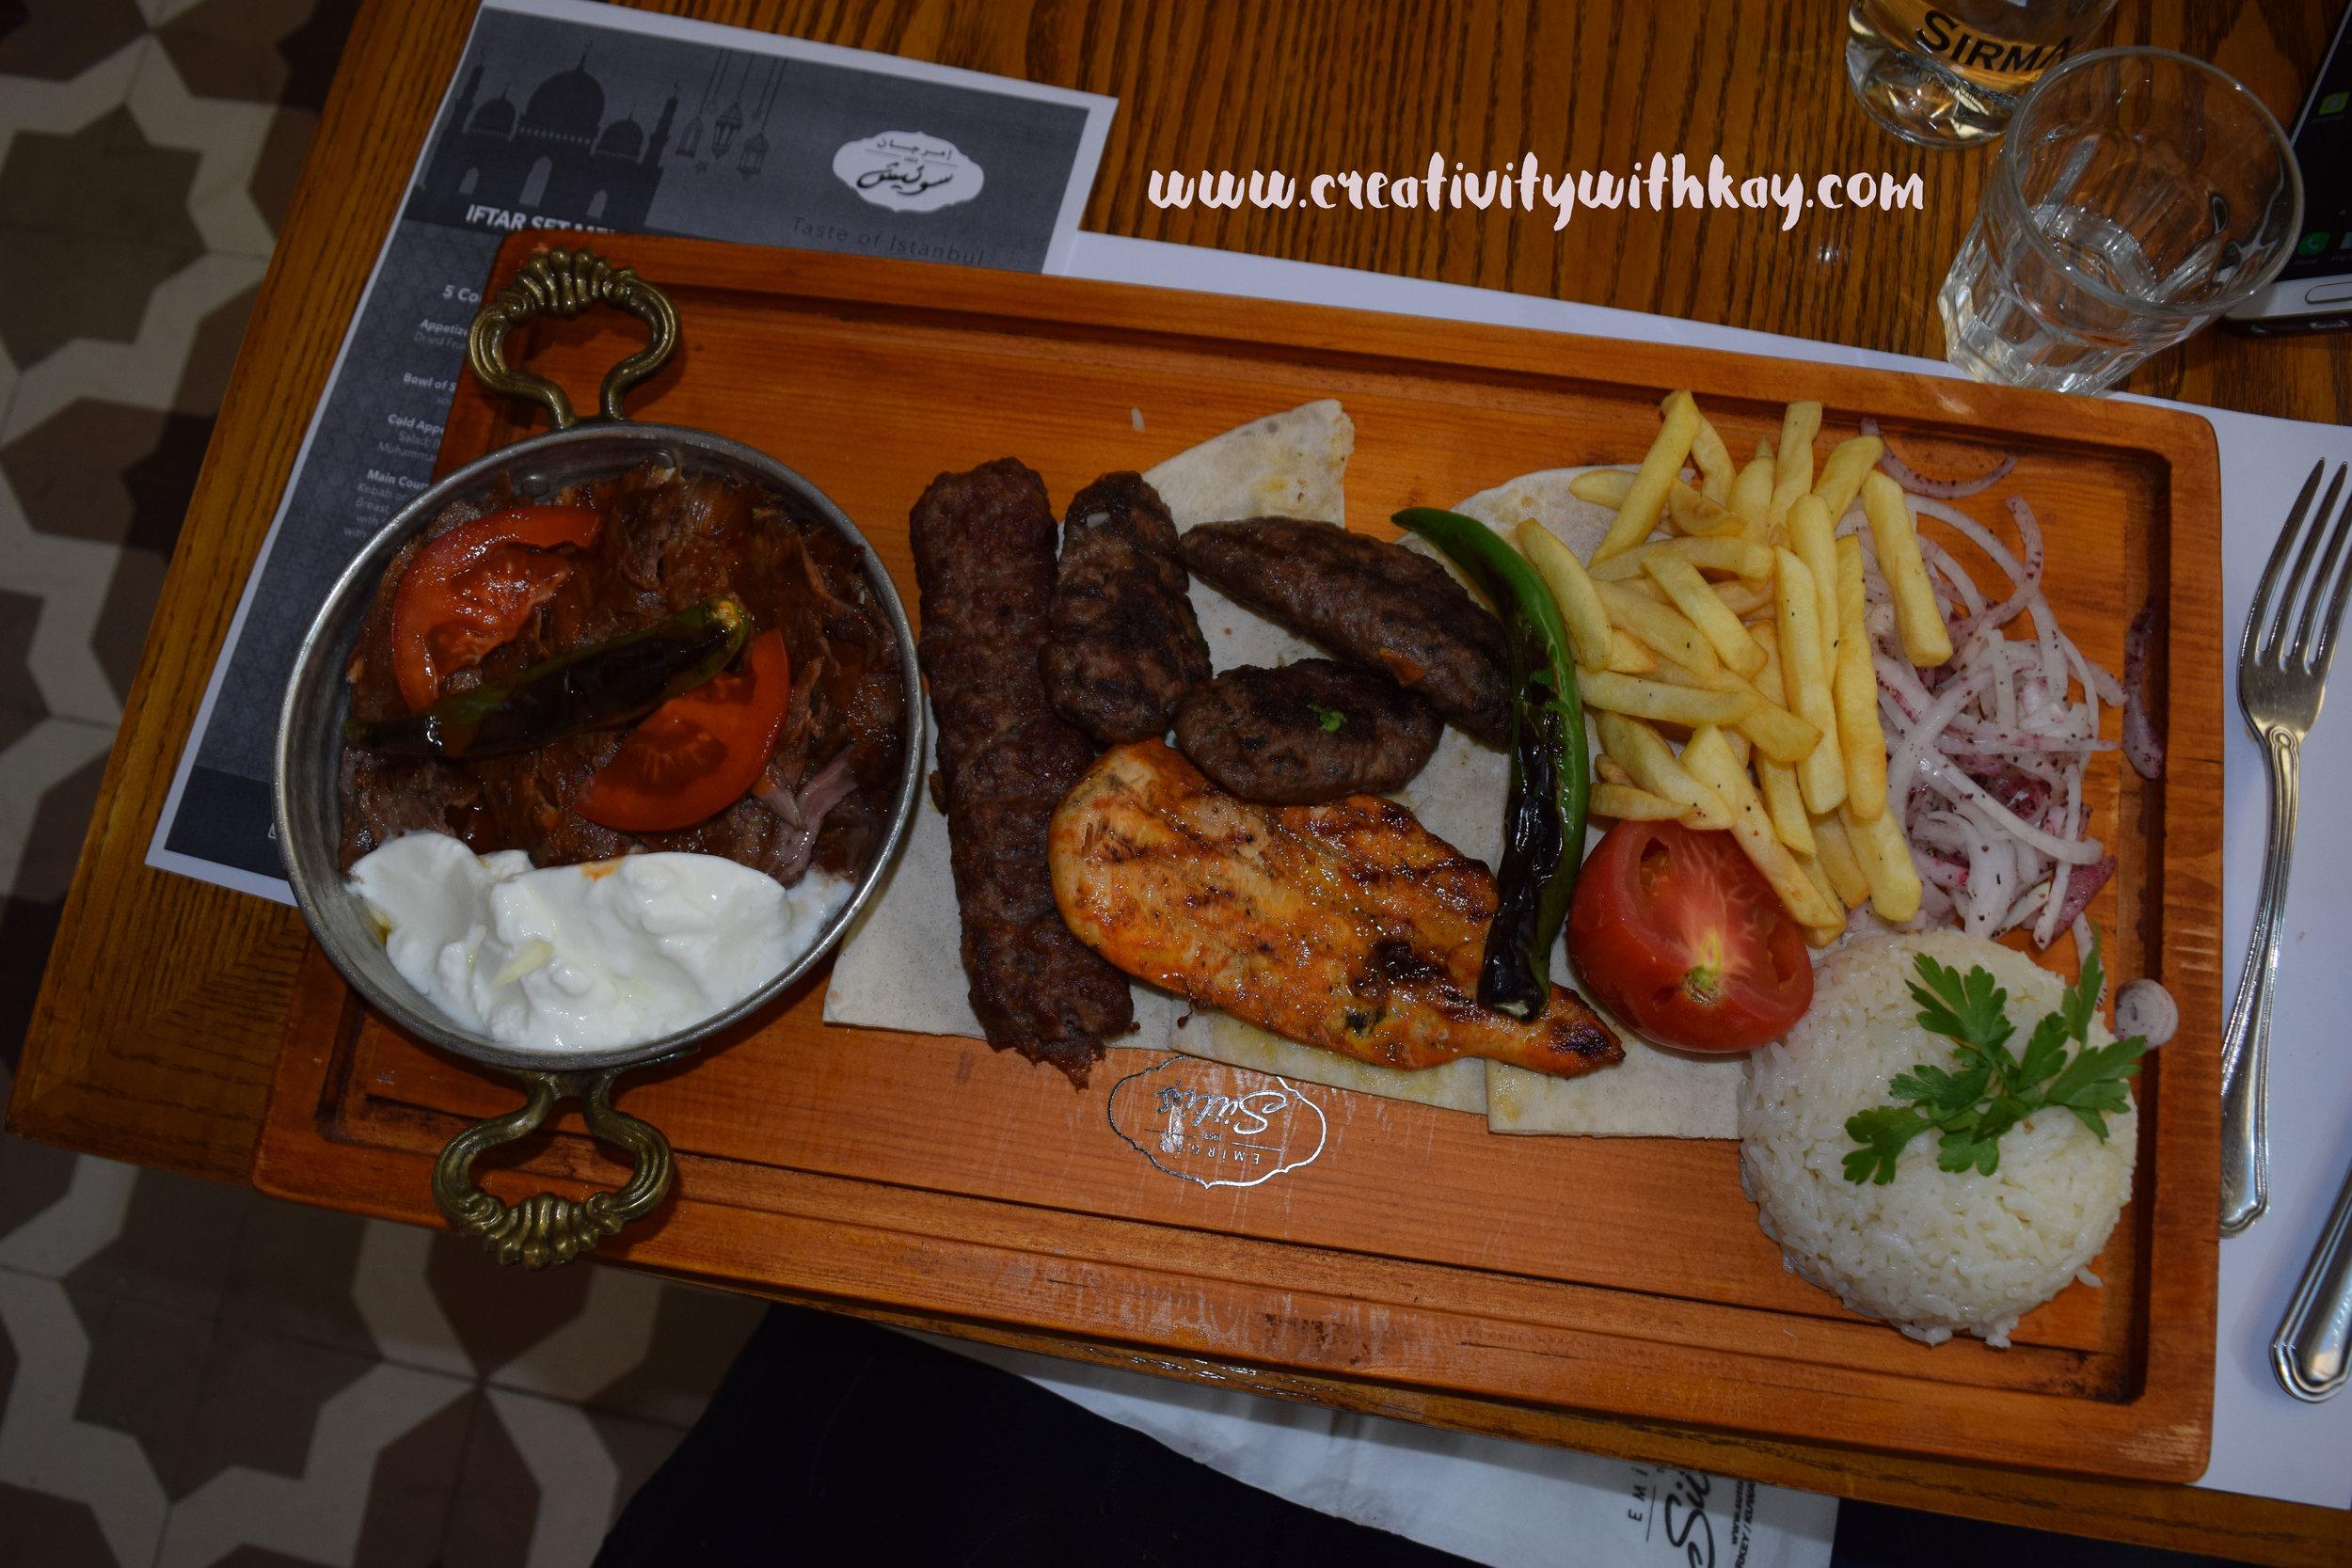 ramadan-2016-iftar-qatar-blogger-khansa-turkish-emirgansutis-maincourse.jpg